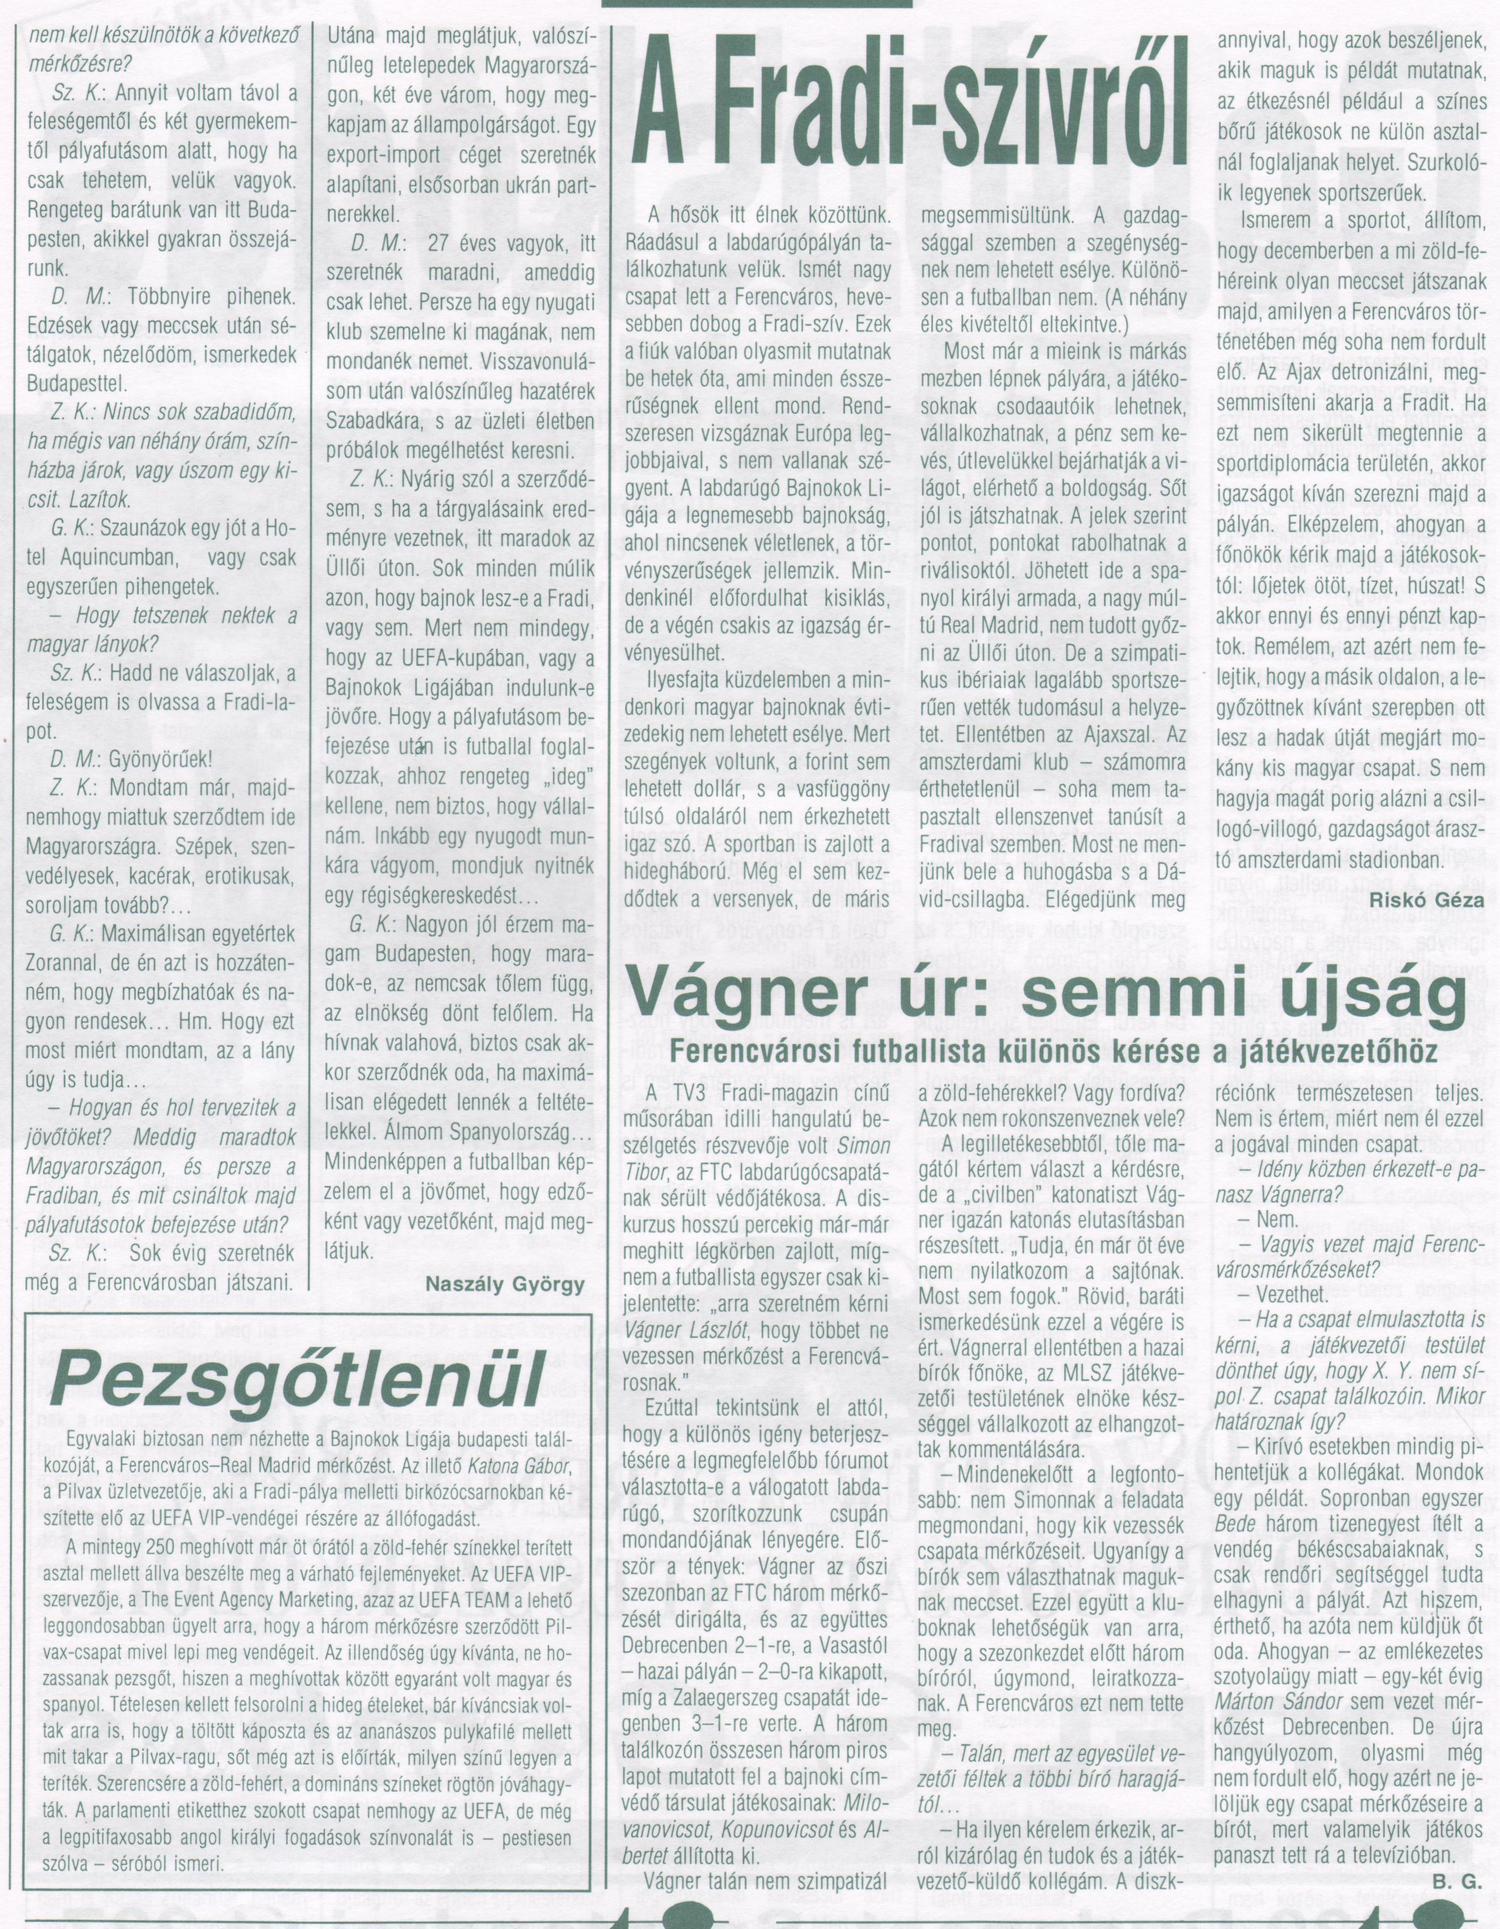 TFU_19951101_FU_008 - 0011